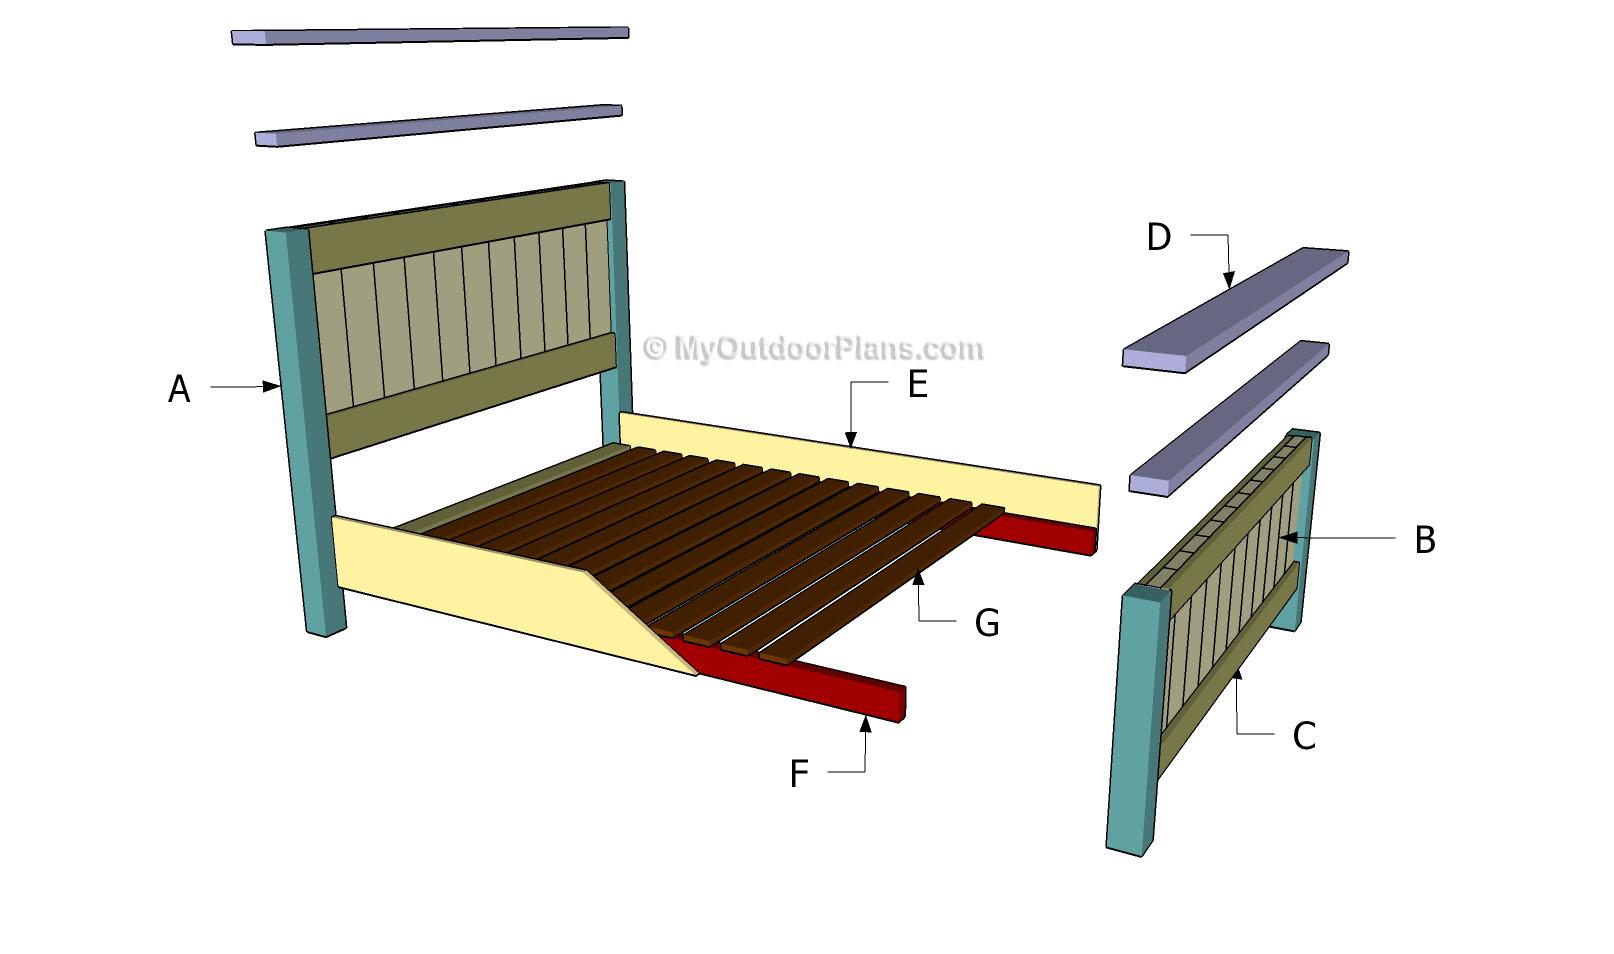 Queen Size Bed Plans | MyOutdoorPlans | Free Woodworking Plans and ...